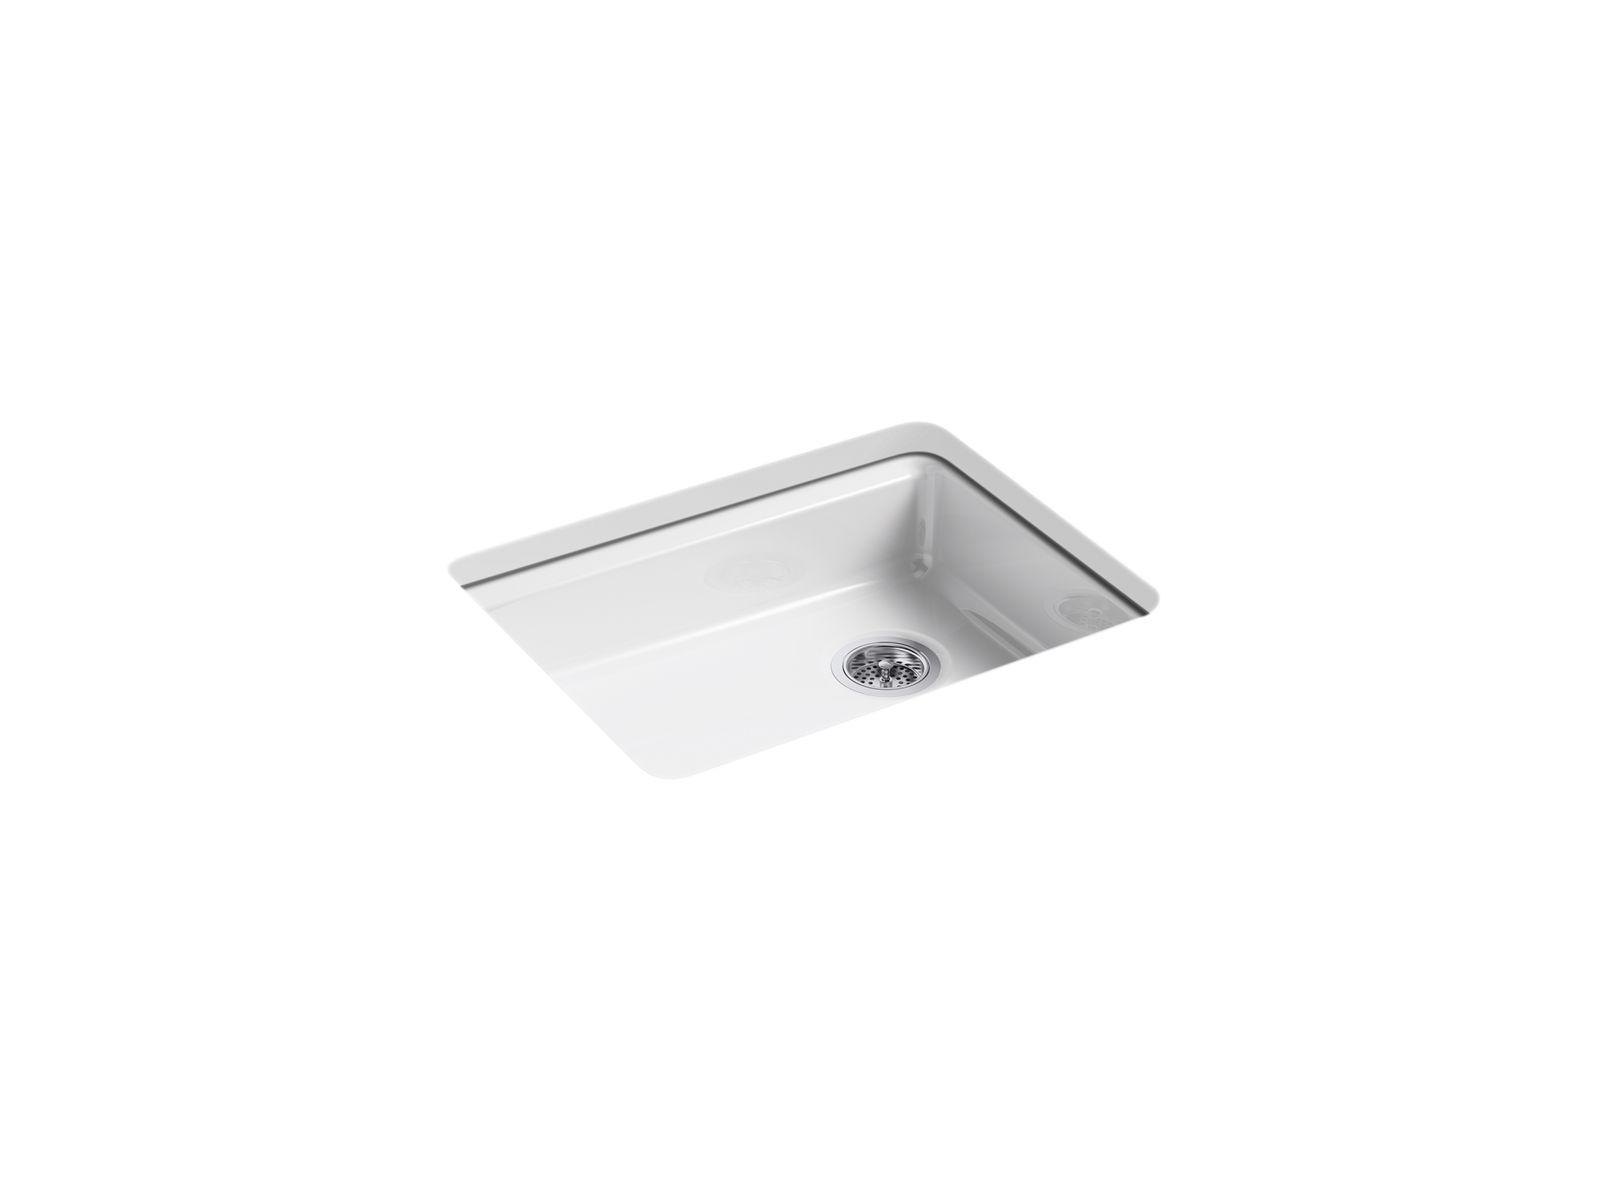 riverby undermount single bowl kitchen sink k 5479 5u kohler kohler